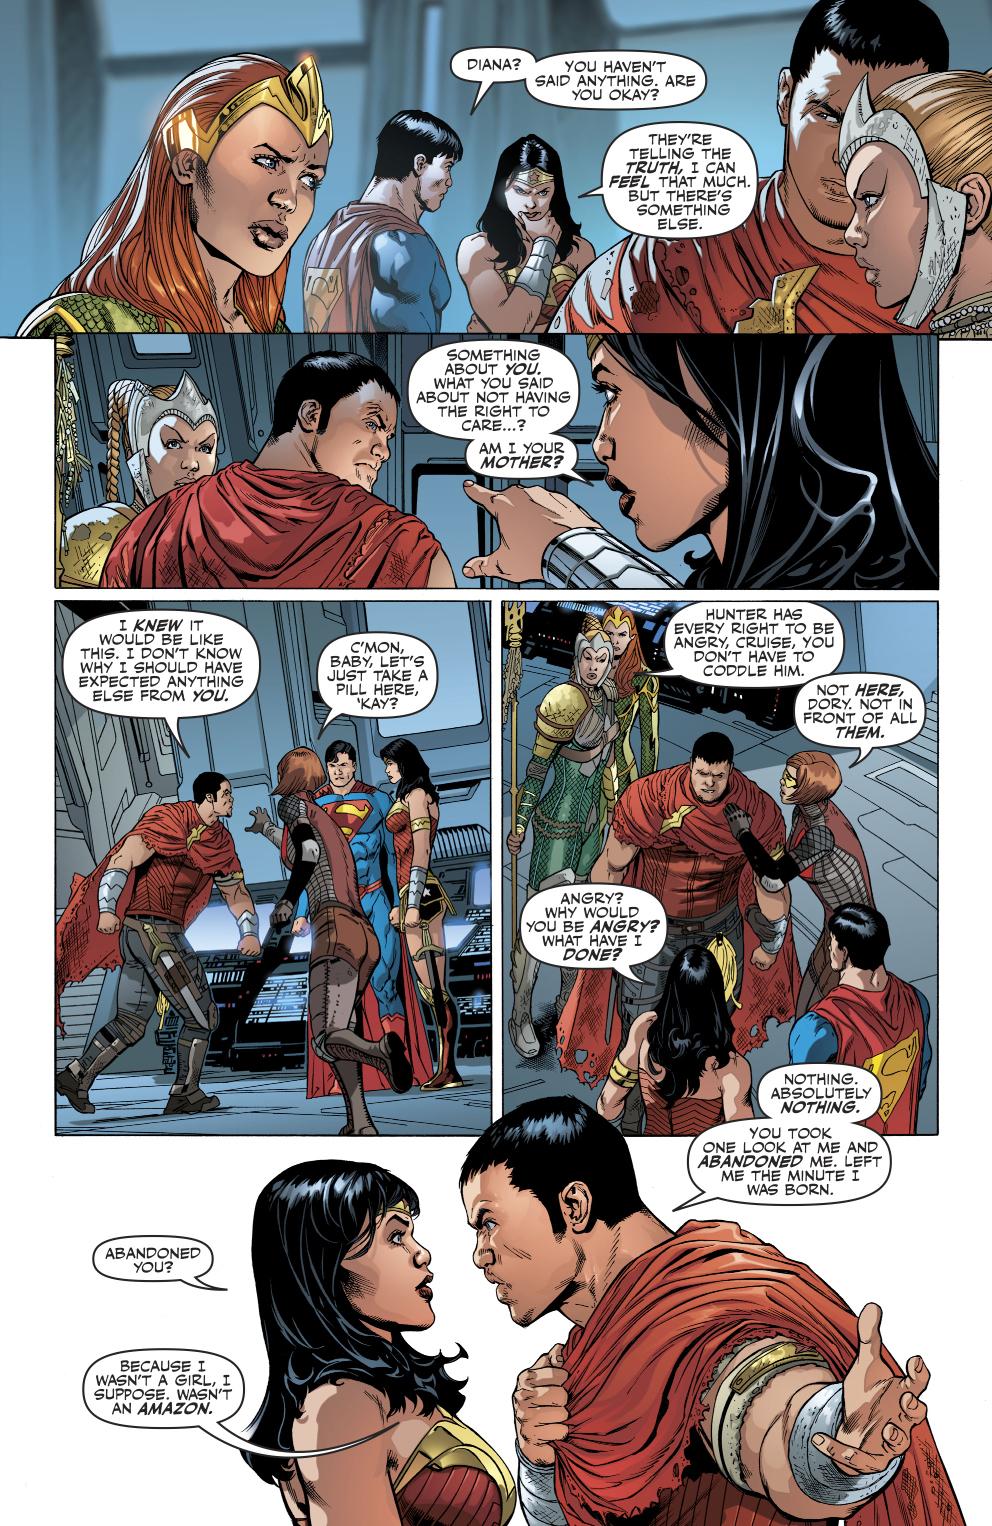 Wonder Woman's Future Son Hunter Prince